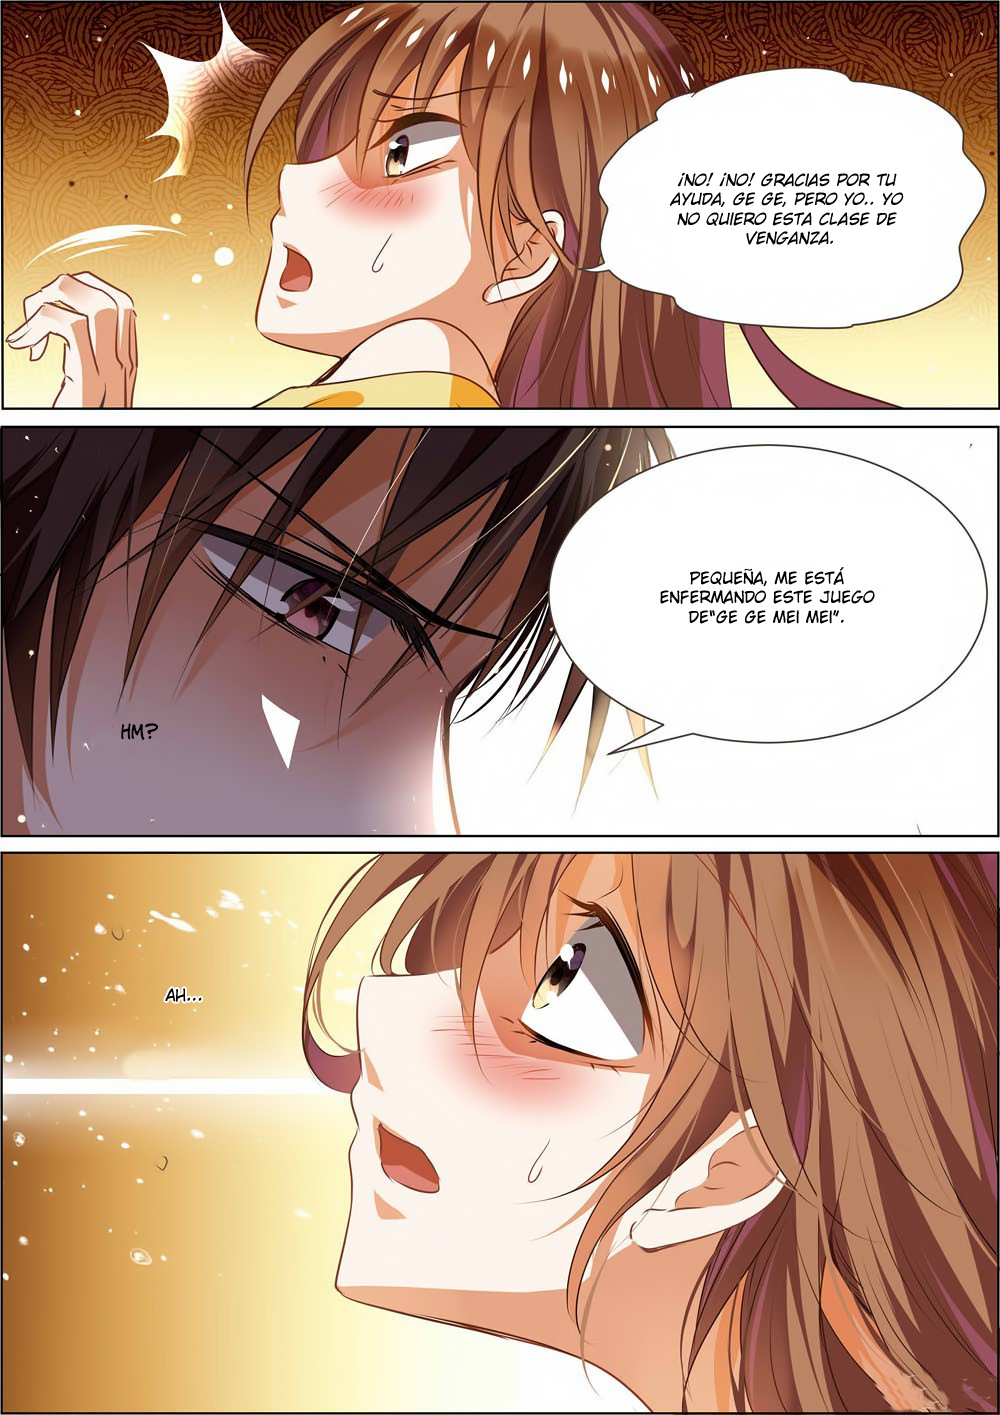 https://c5.ninemanga.com/es_manga/5/16069/395470/099ba65d1143542d90b8c40c0df683bd.jpg Page 6